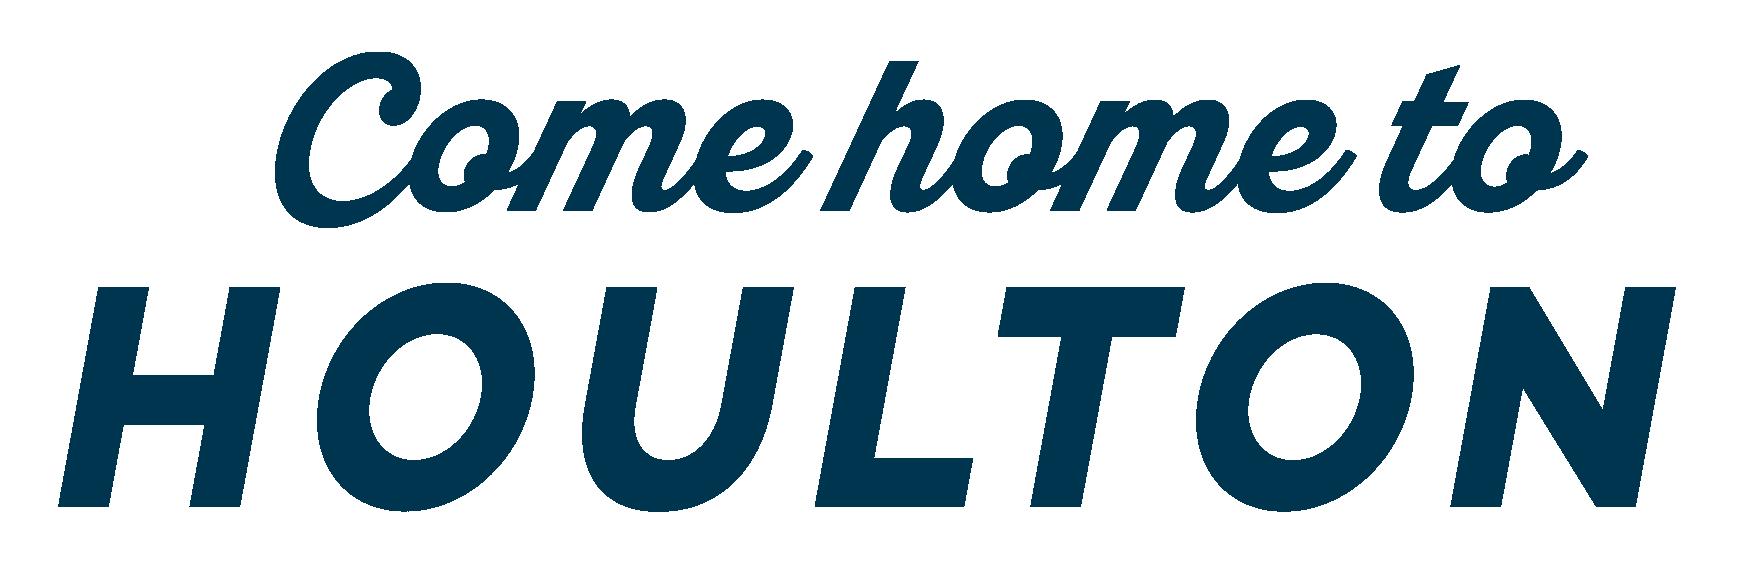 come-home-to-houlton-graduated-logo-night-sky